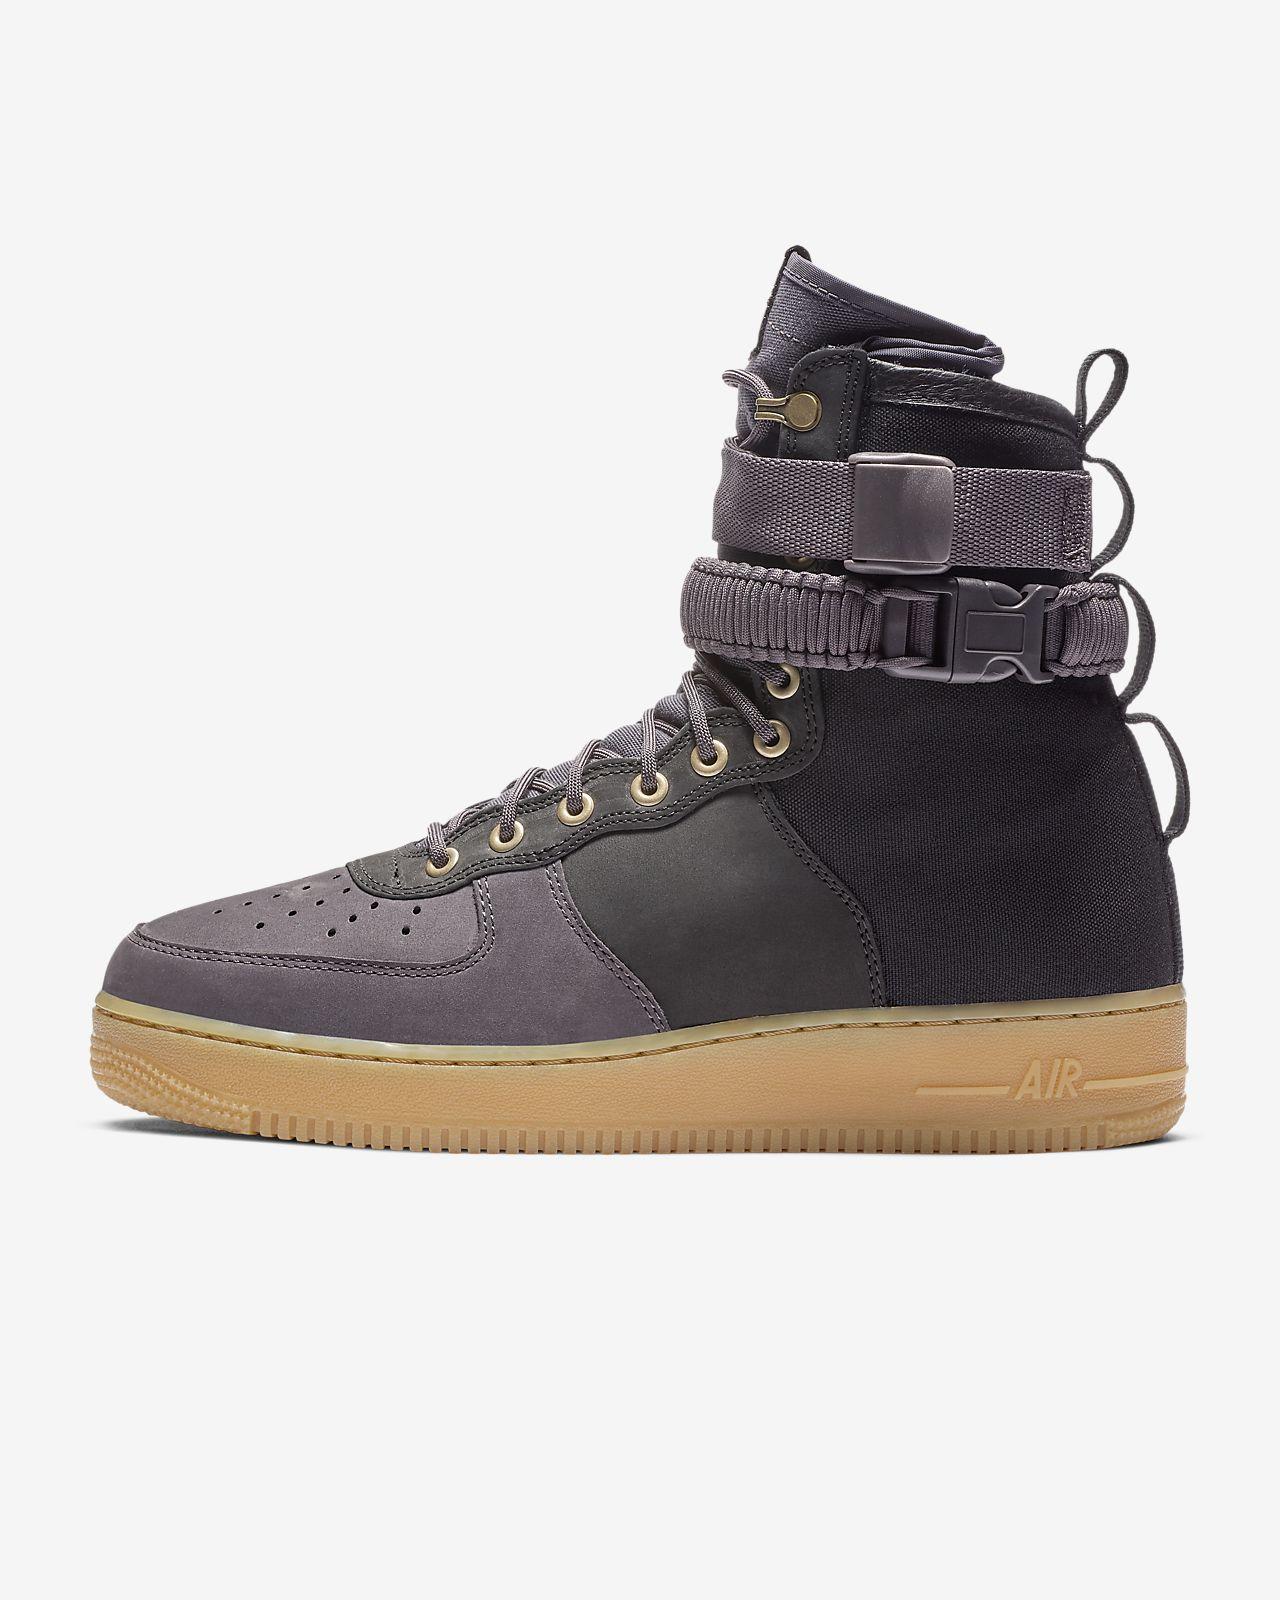 buy popular d5e5d b7b74 ... Calzado para hombre Nike SF Air Force 1 Premium